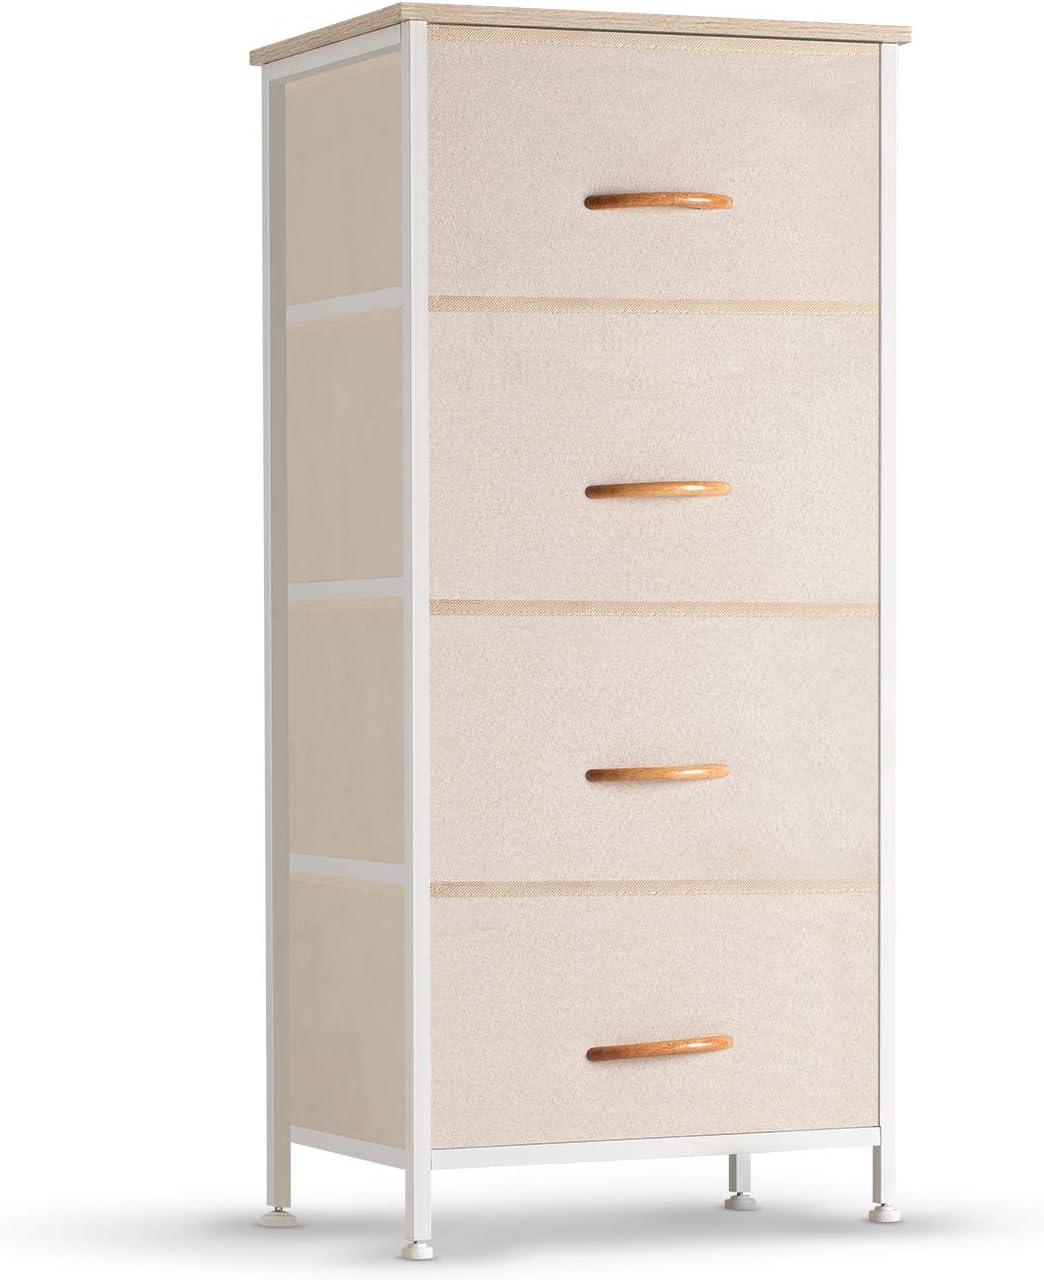 COSYLAND 4 Drawer Dresser Storage Over item handling ☆ Organizer Fabric S Max 90% OFF Unit Tower